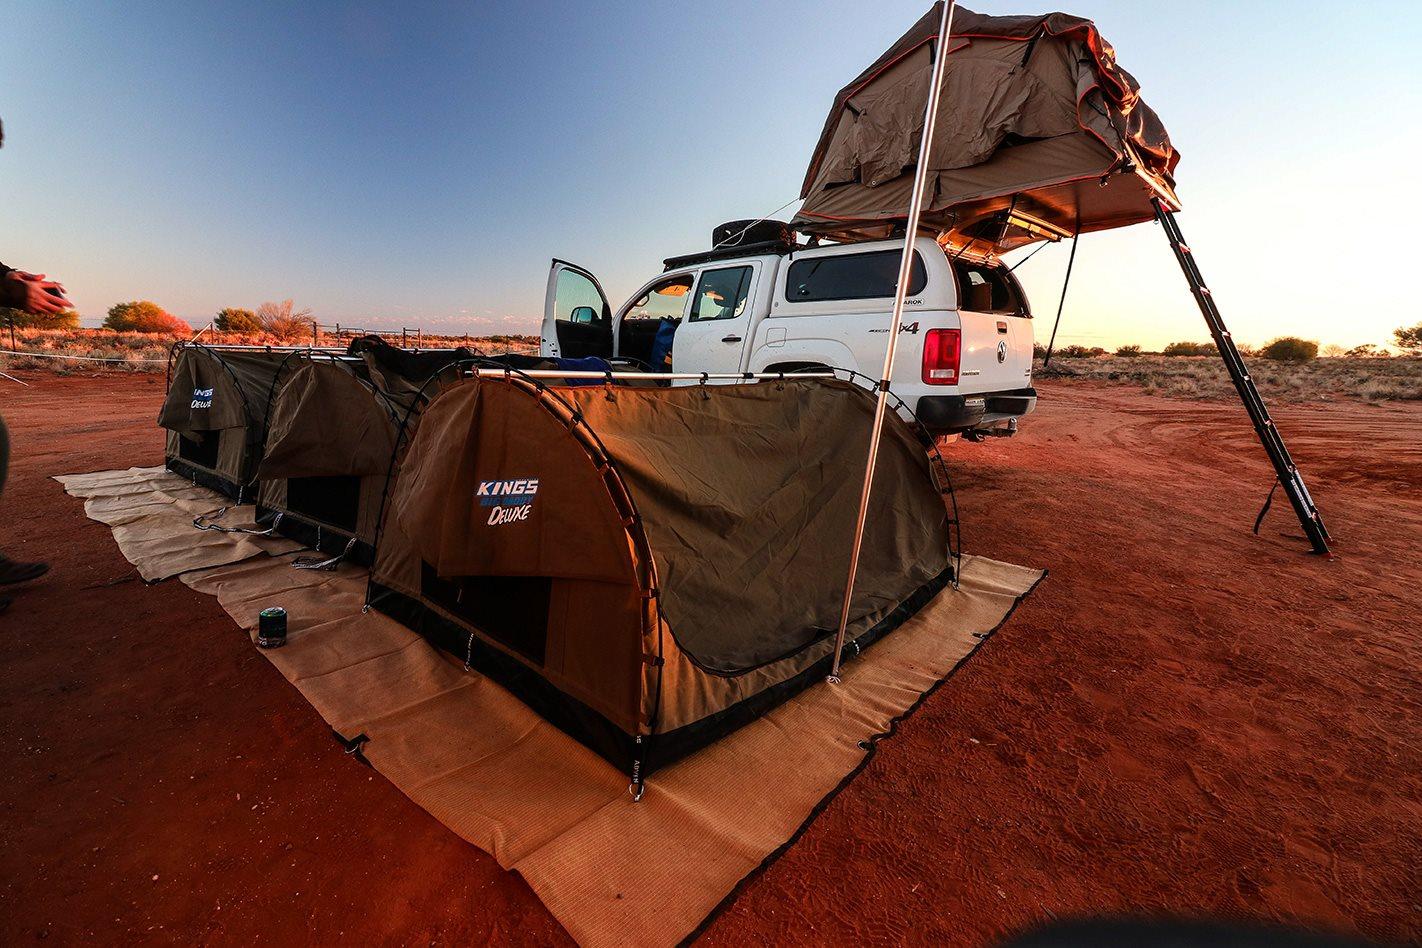 Volkswagen Amarok camping set up